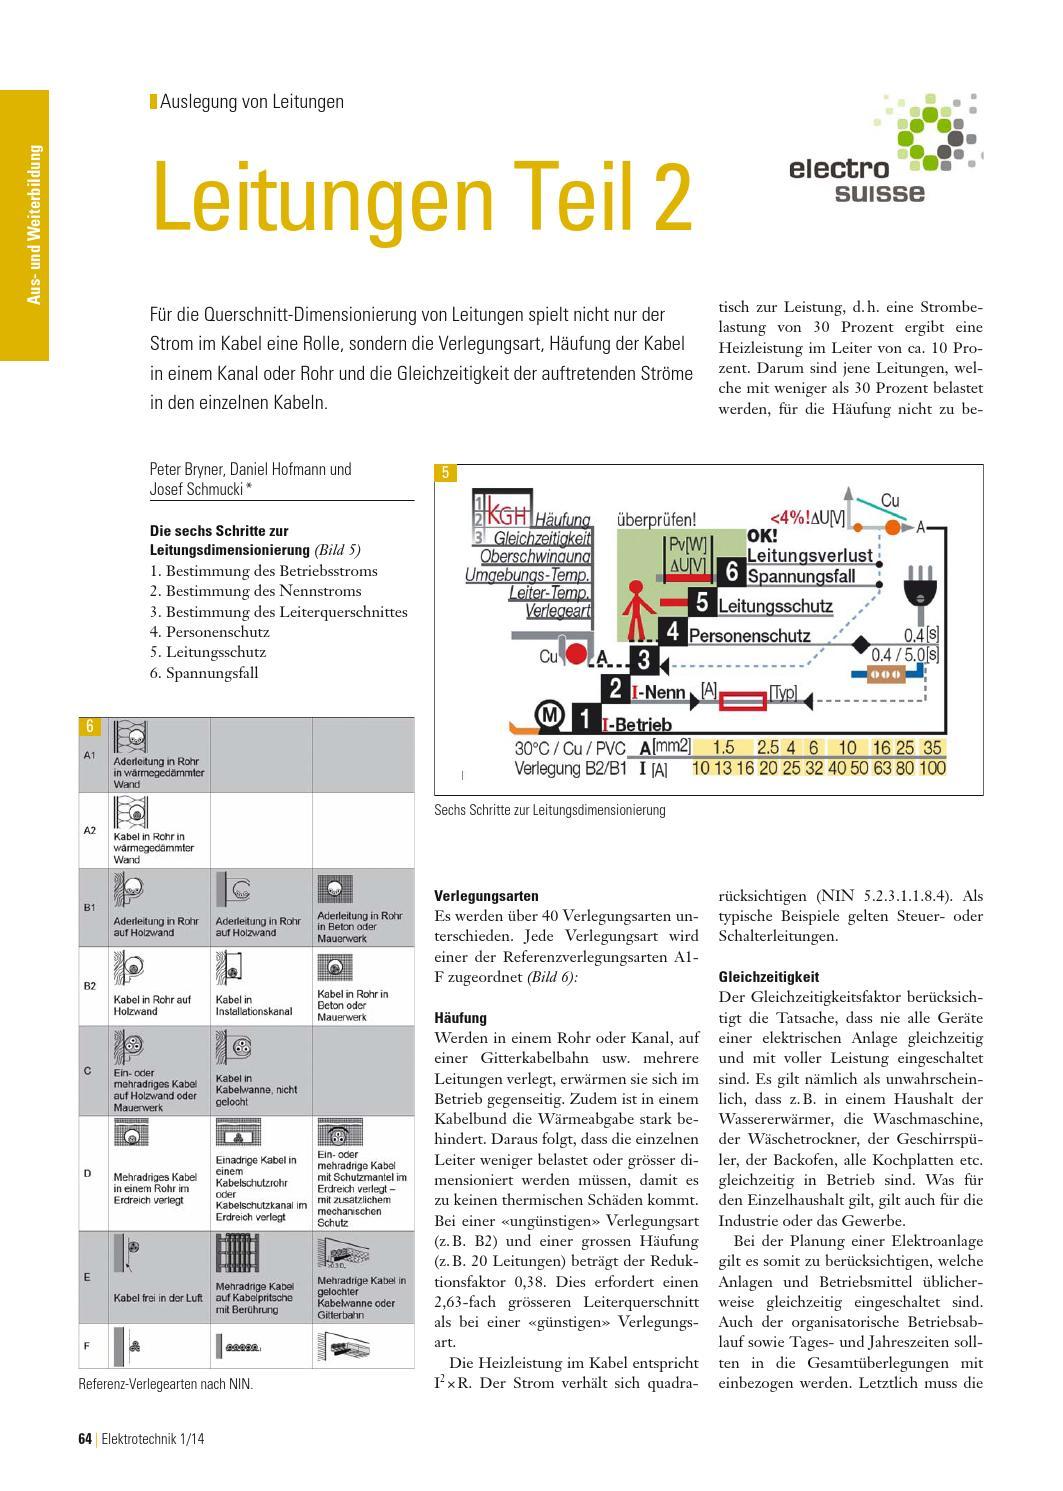 Elektrotechnik 01/2014 by AZ Fachverlage AG - issuu